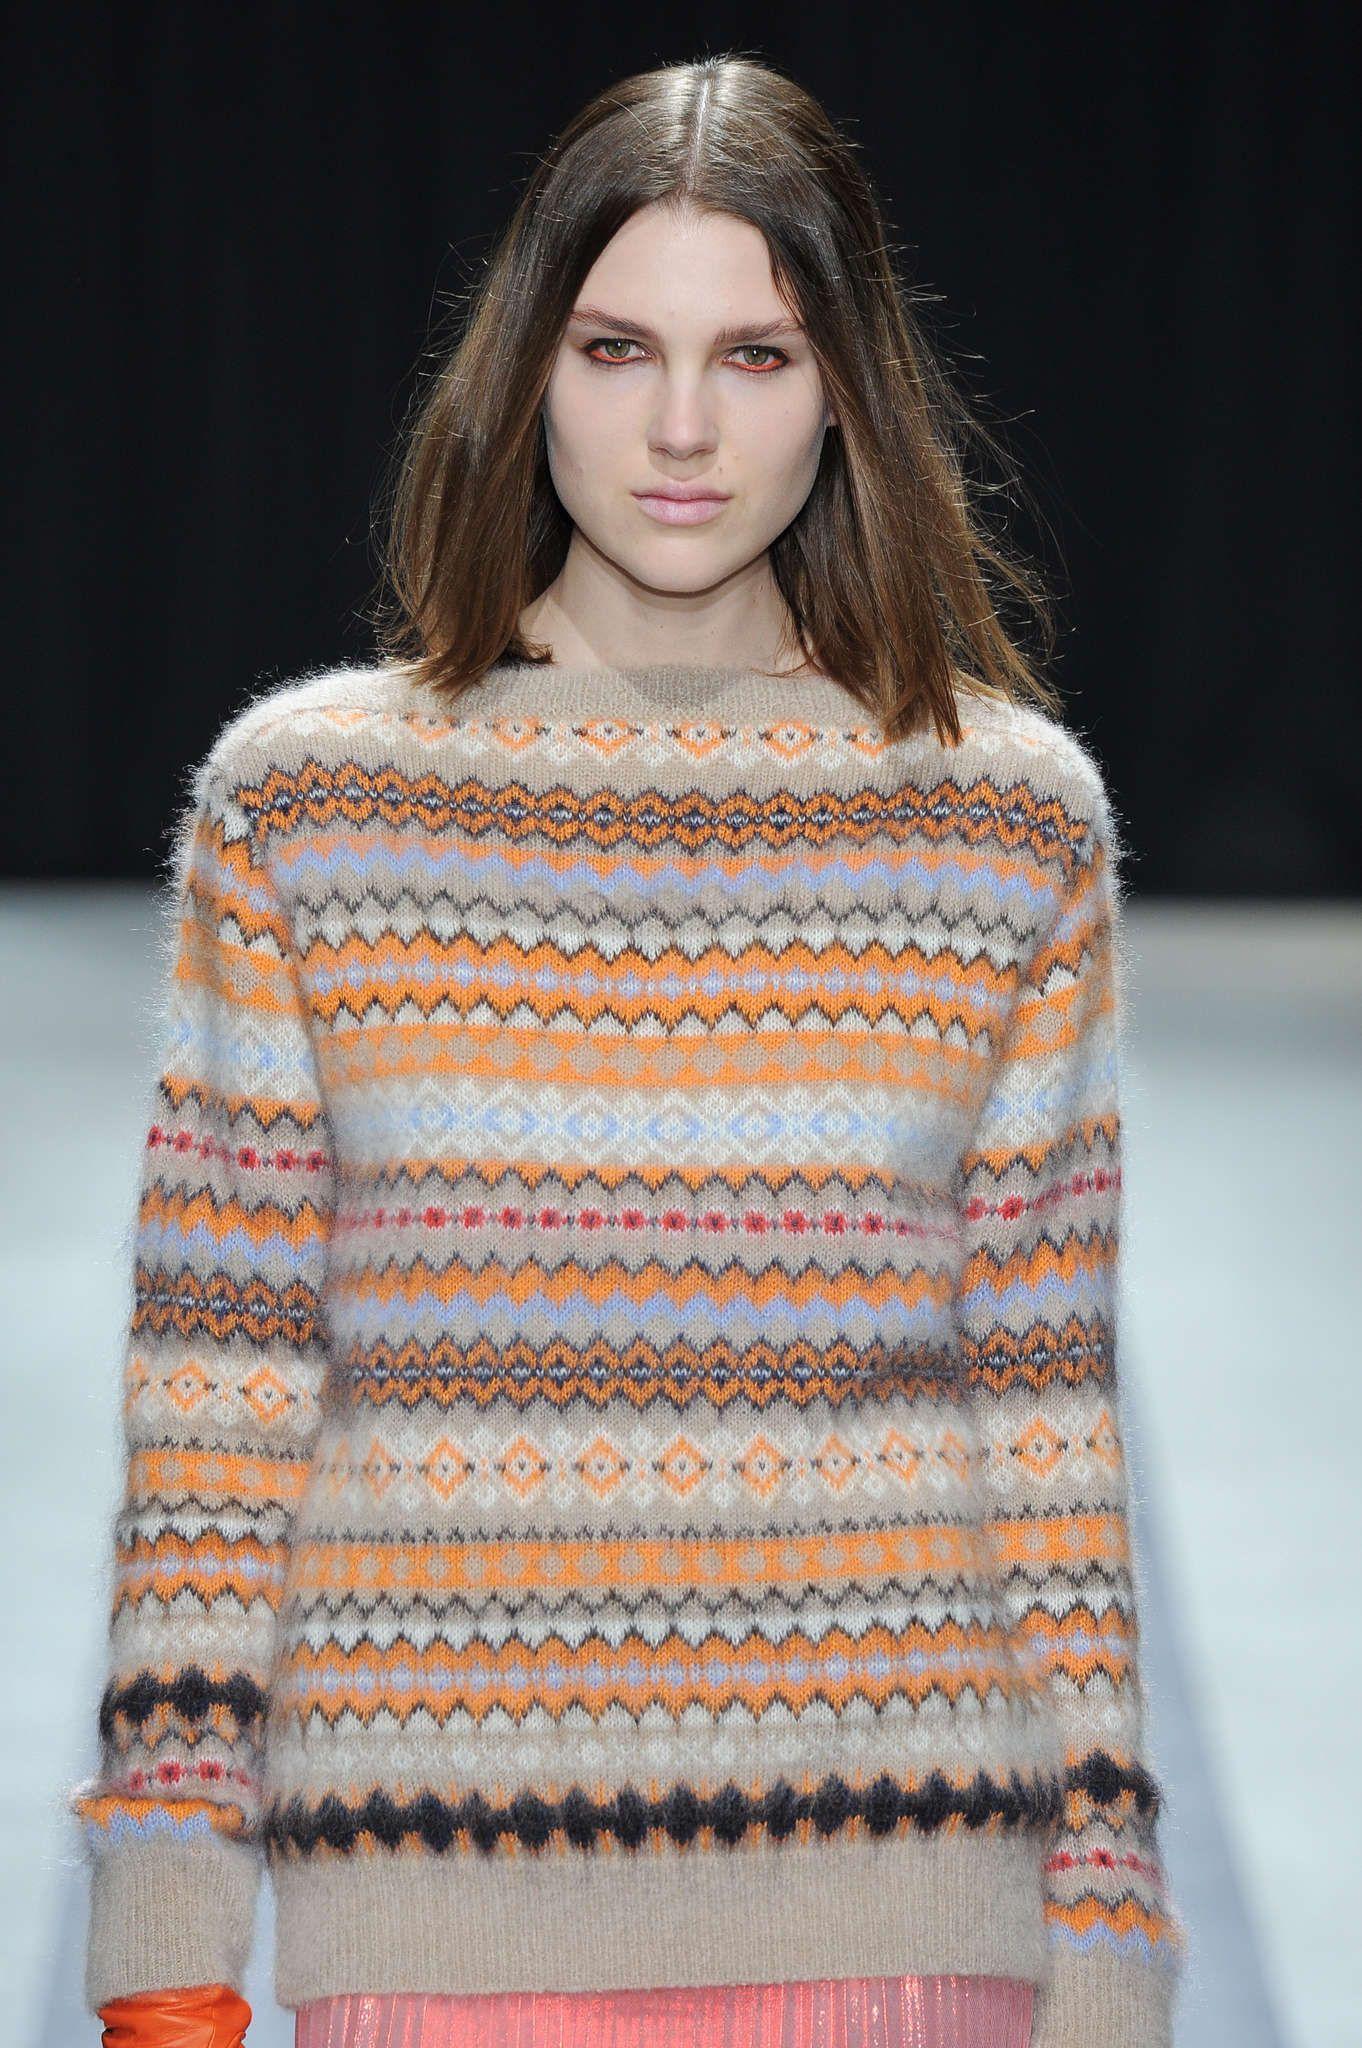 Lovely sweater. Veronique Branquinho